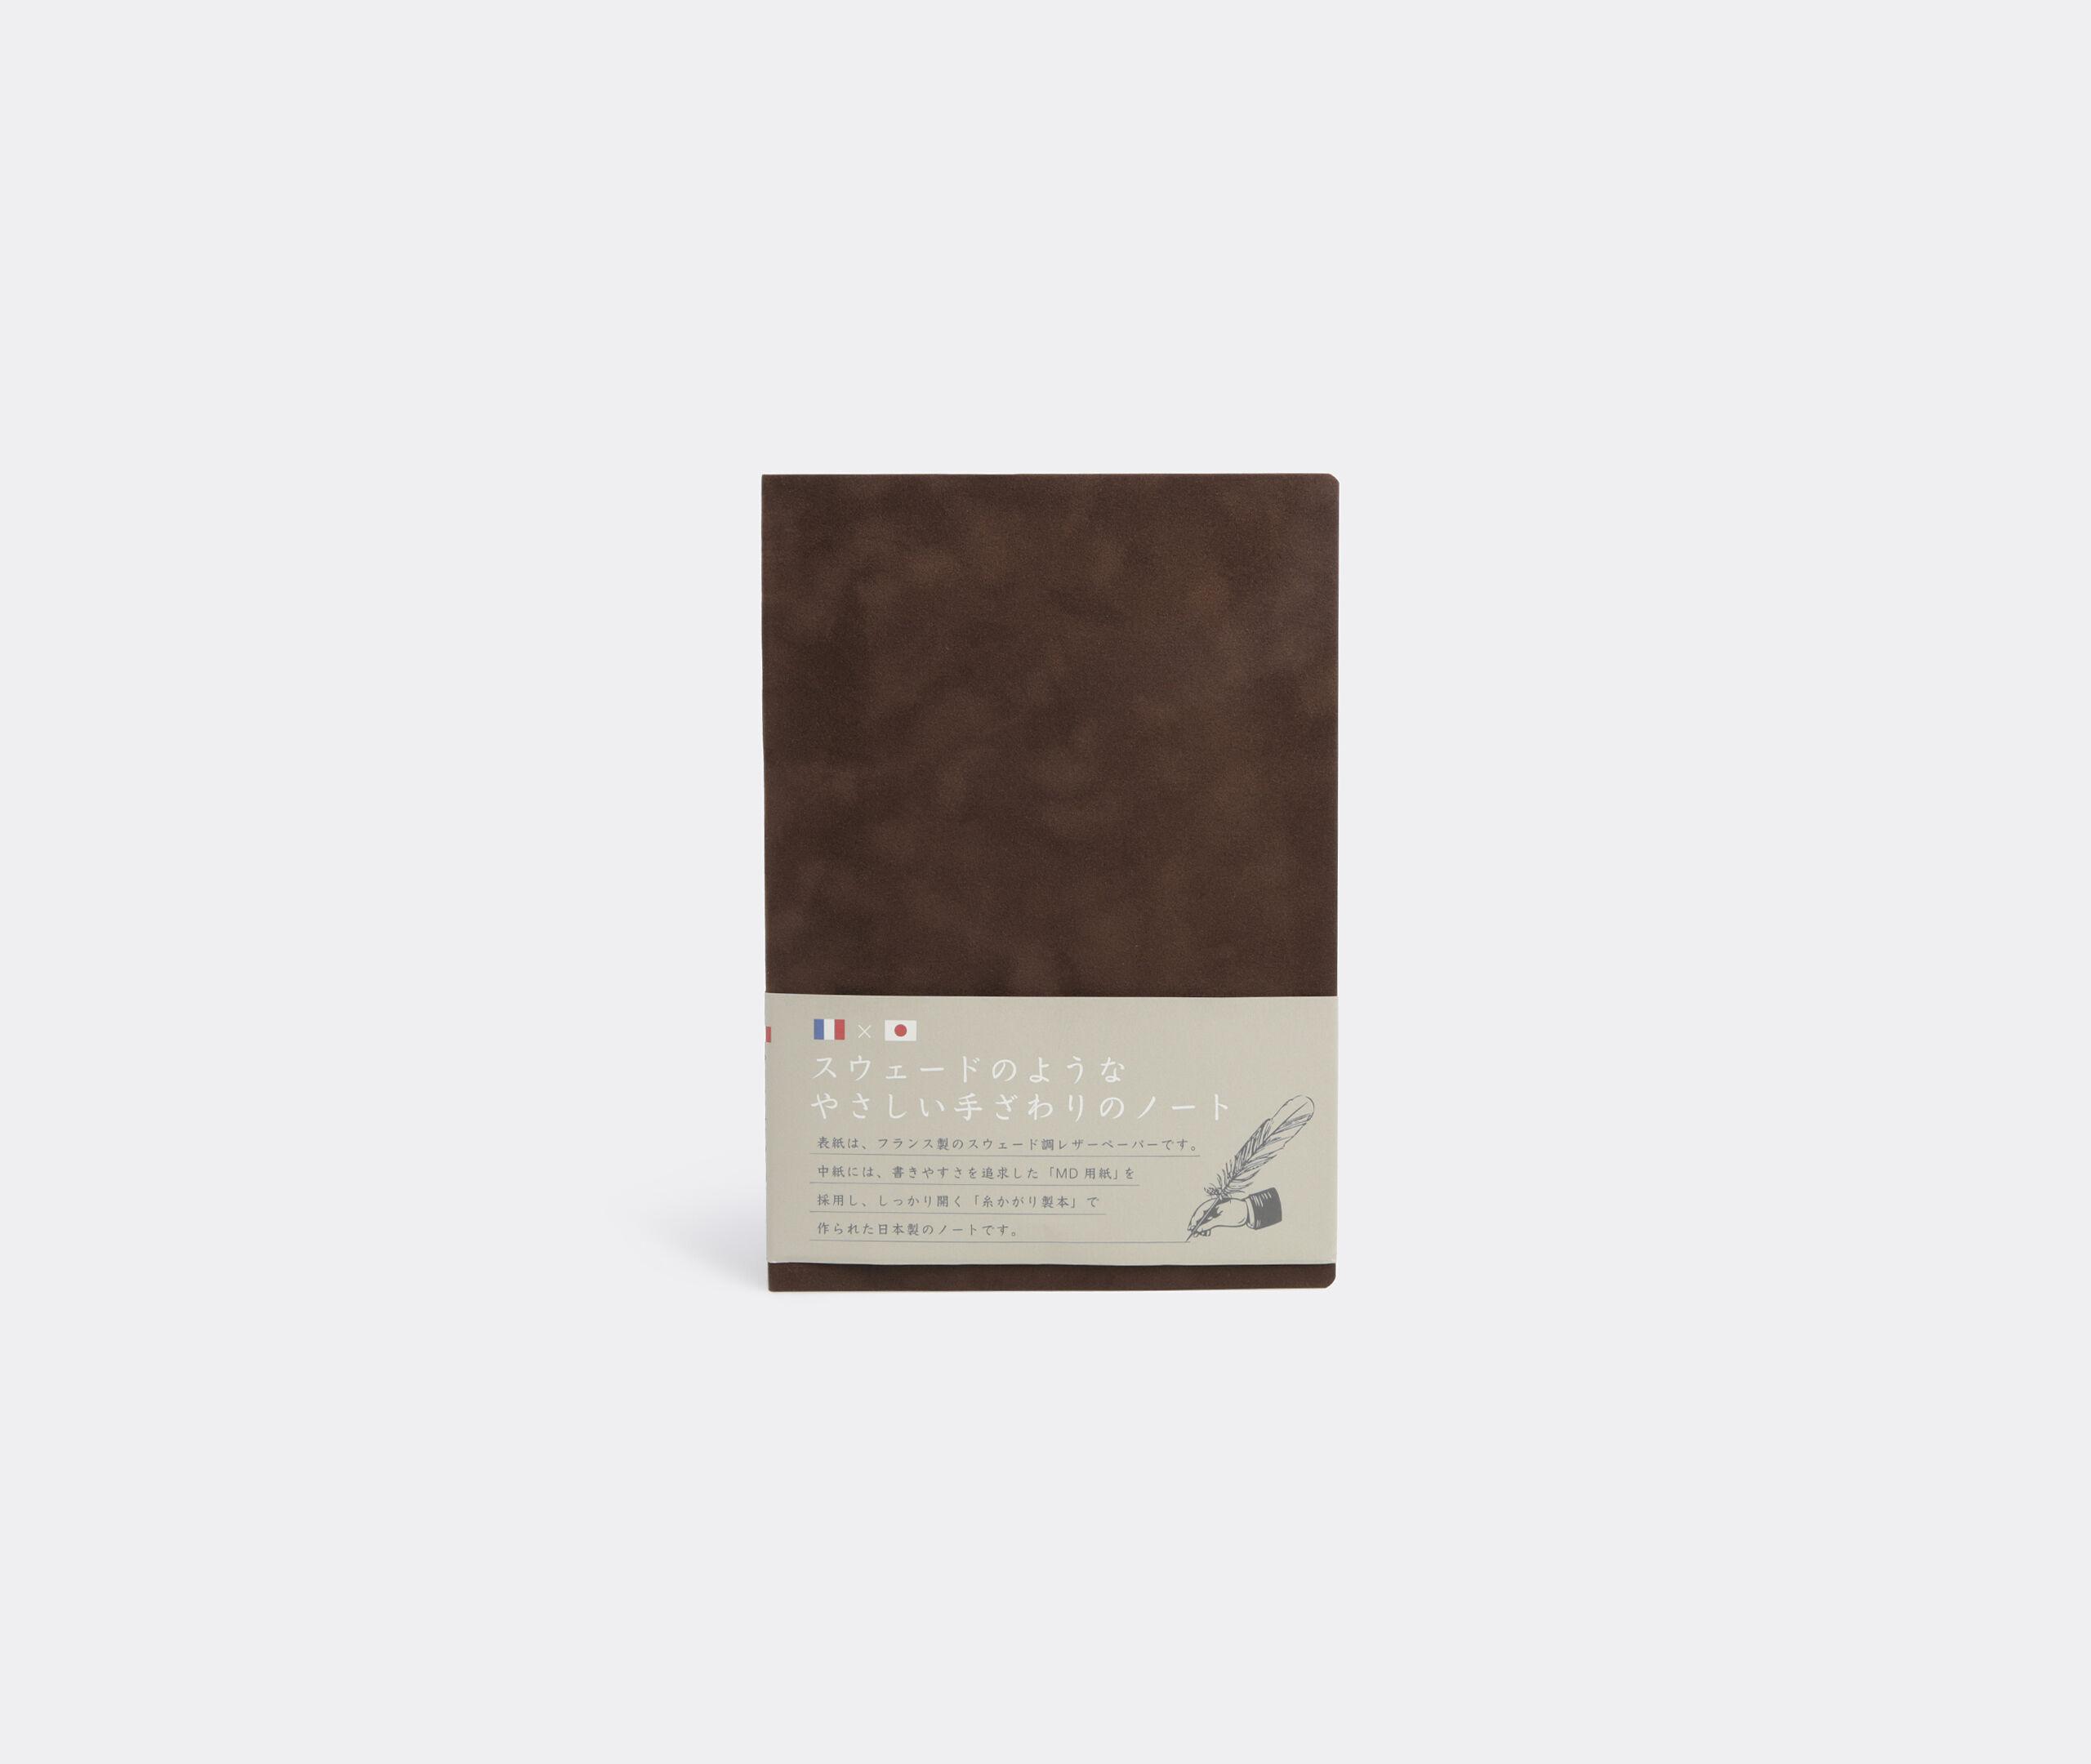 Wm Notebook Dainel <A5> Brown